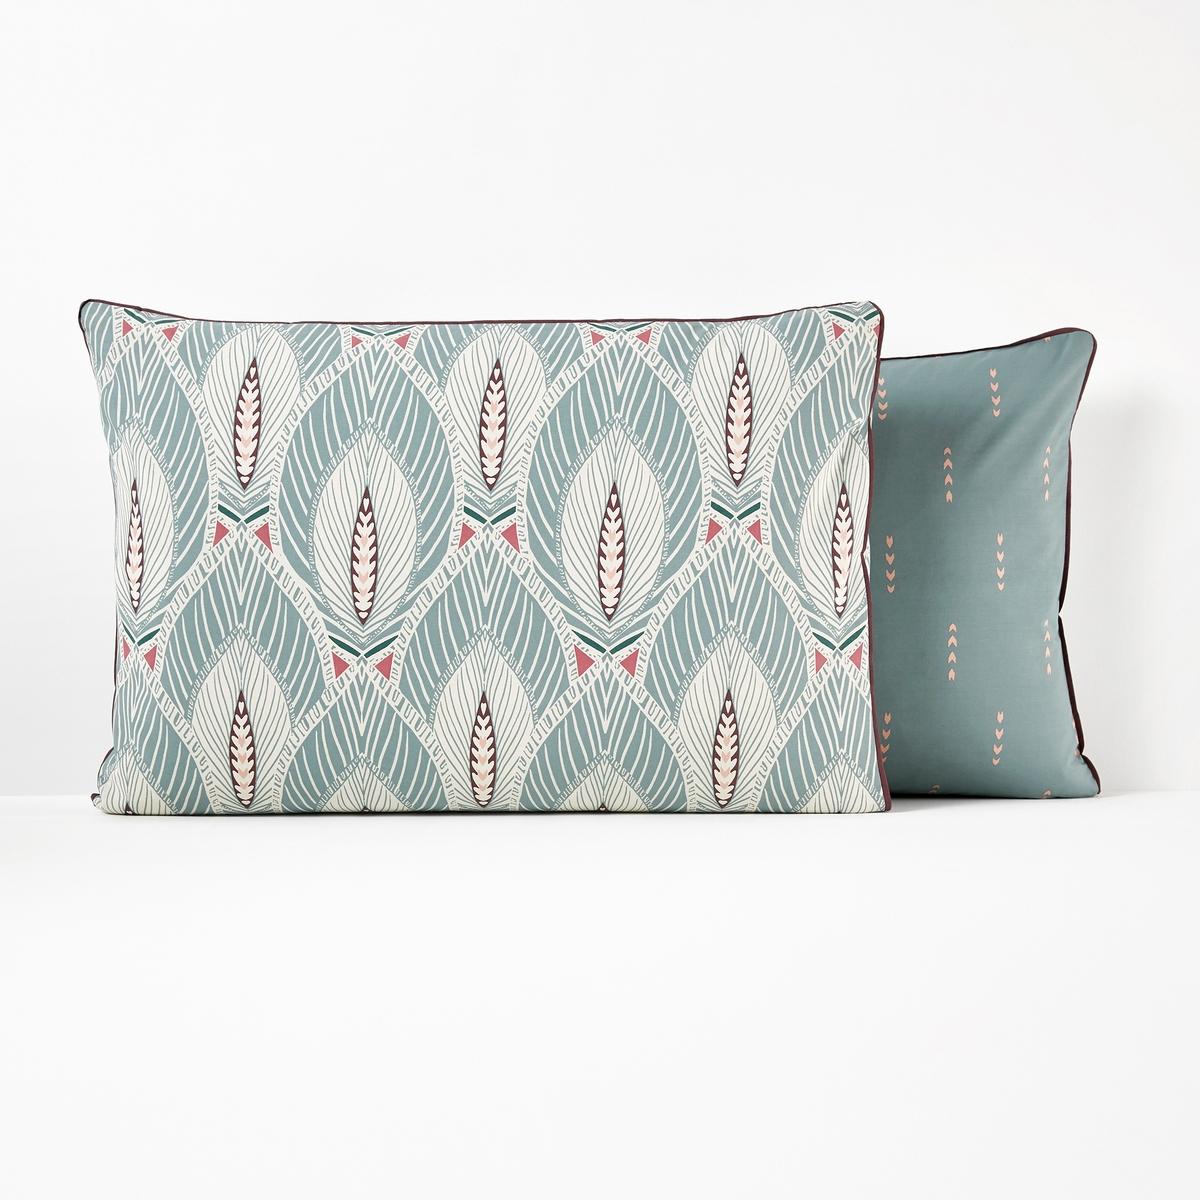 Kissenbezug MARYLEBONE aus Baumwollperkal   Heimtextilien > Bettwäsche und Laken   Blau   La Redoute Interieurs